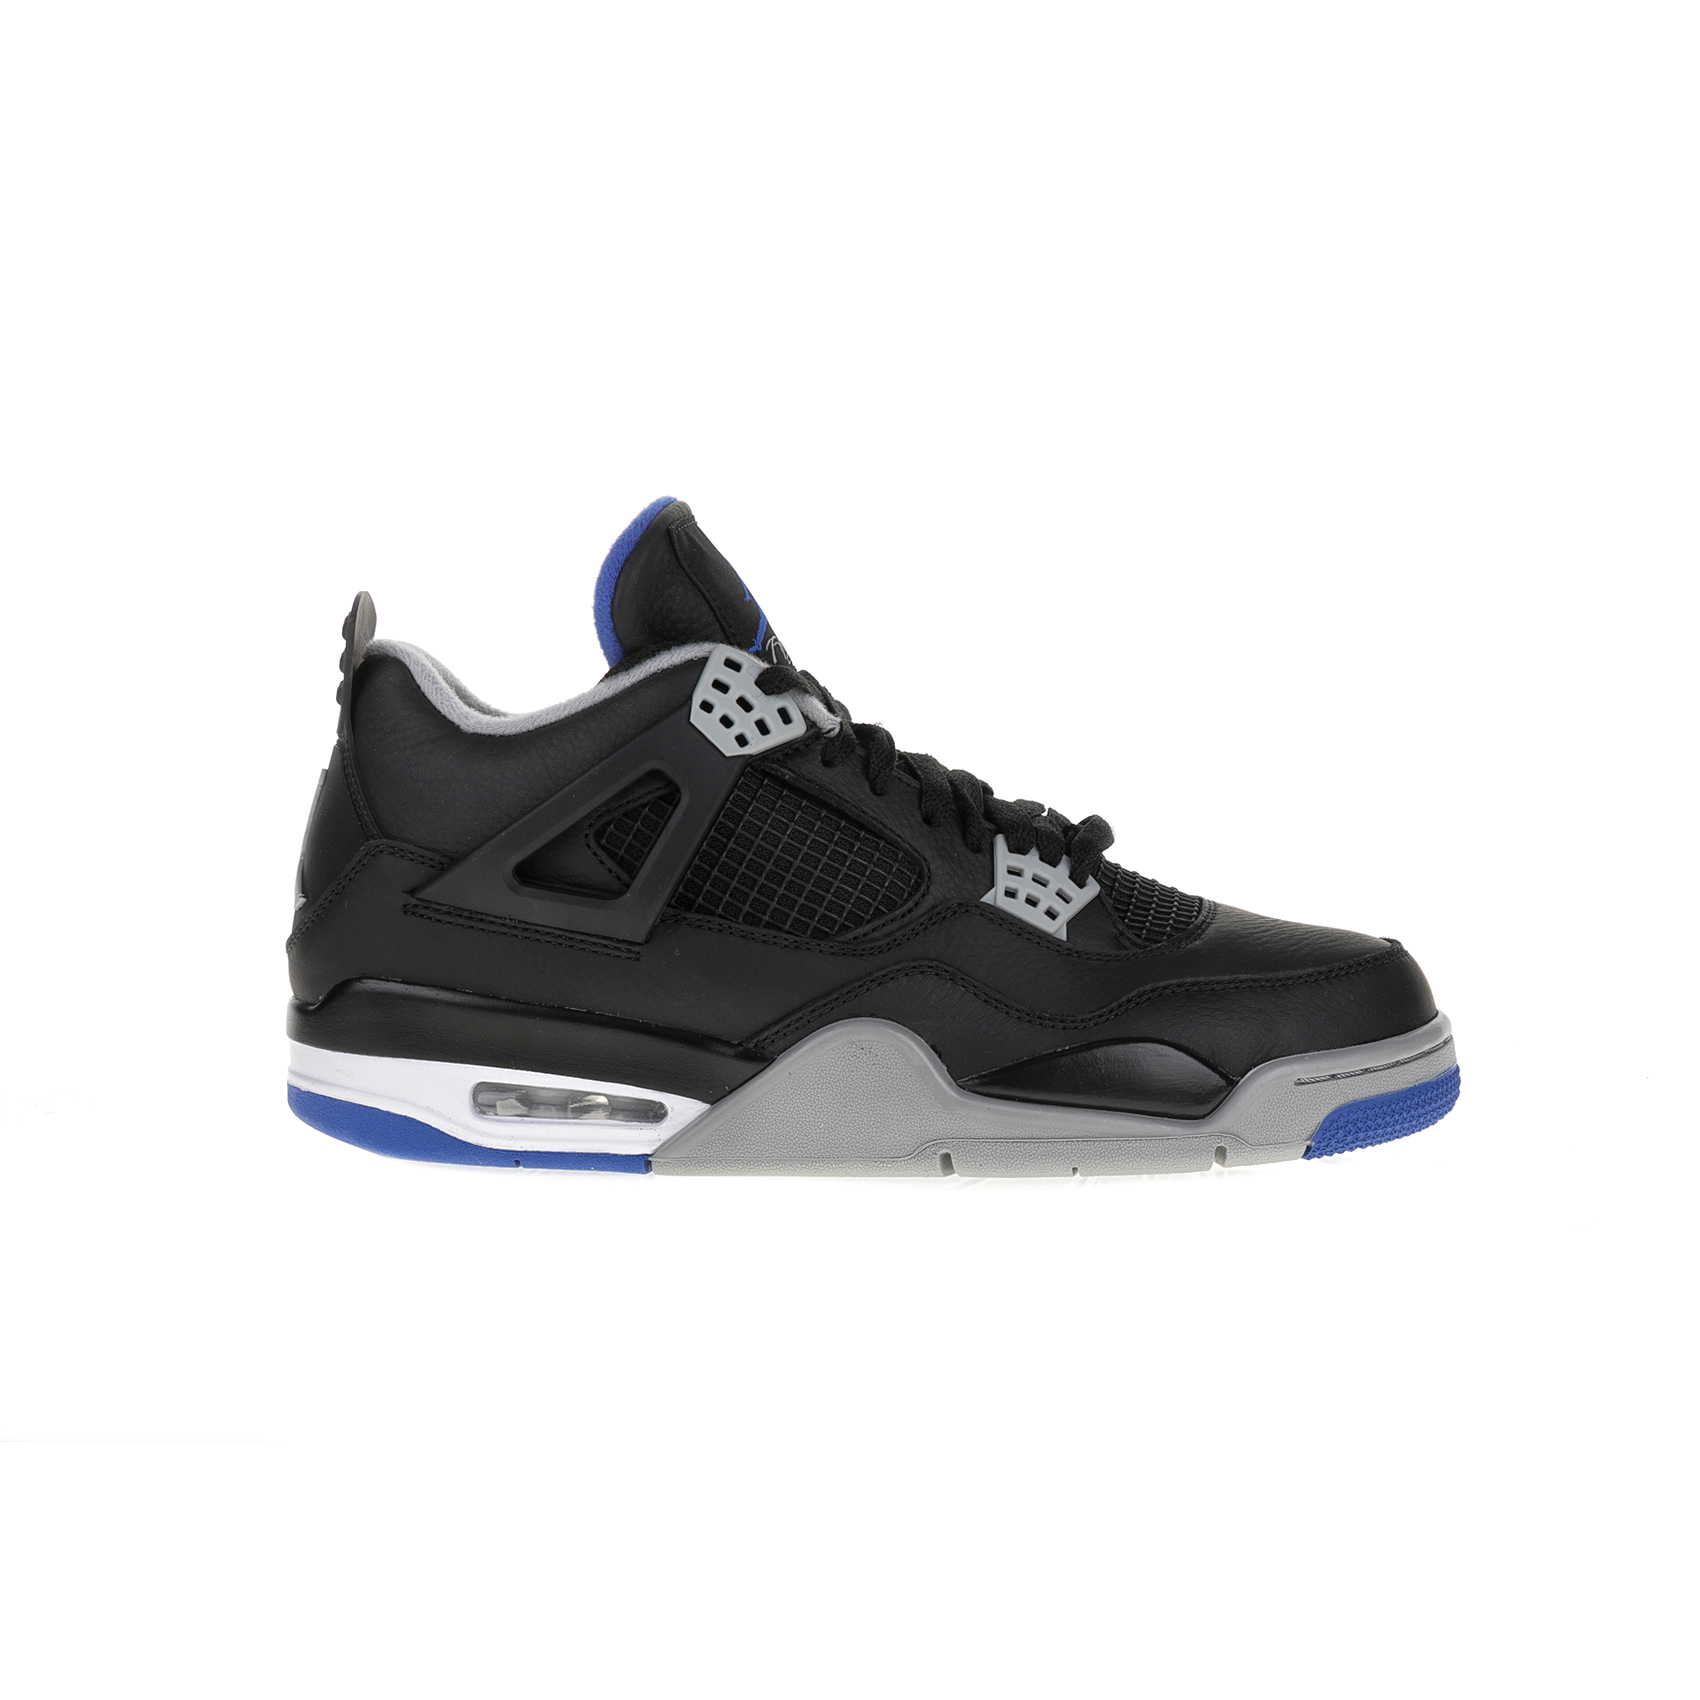 NIKE – Ανδρικά παπούτσια Nike AIR JORDAN 4 RETRO μαύρα